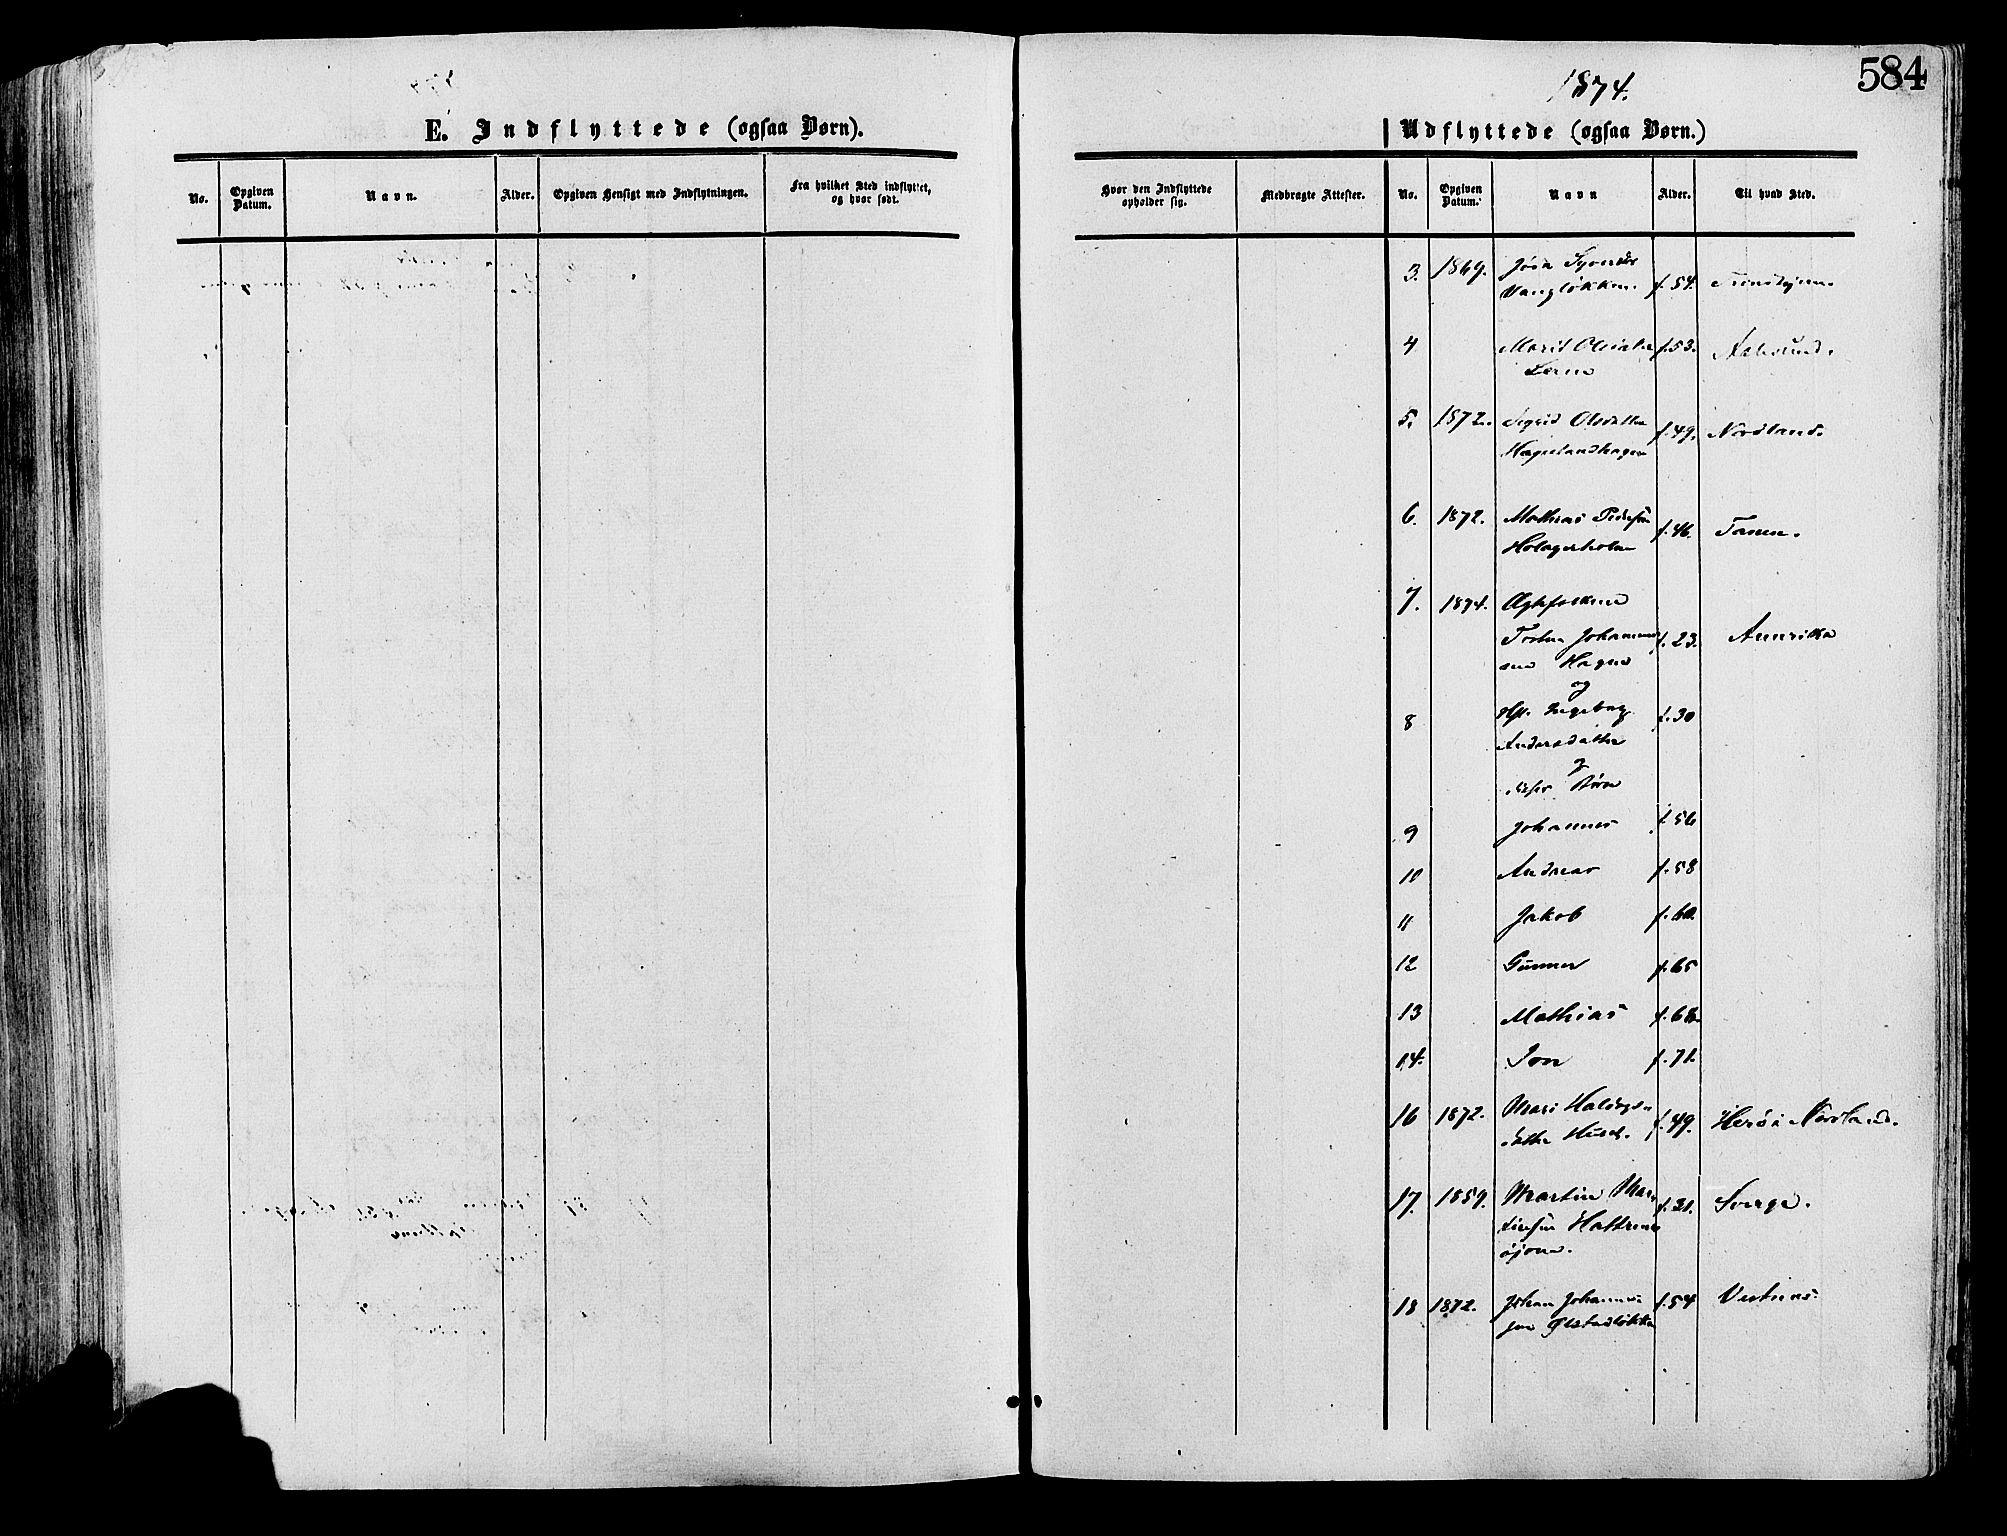 SAH, Lesja prestekontor, Ministerialbok nr. 8, 1854-1880, s. 584